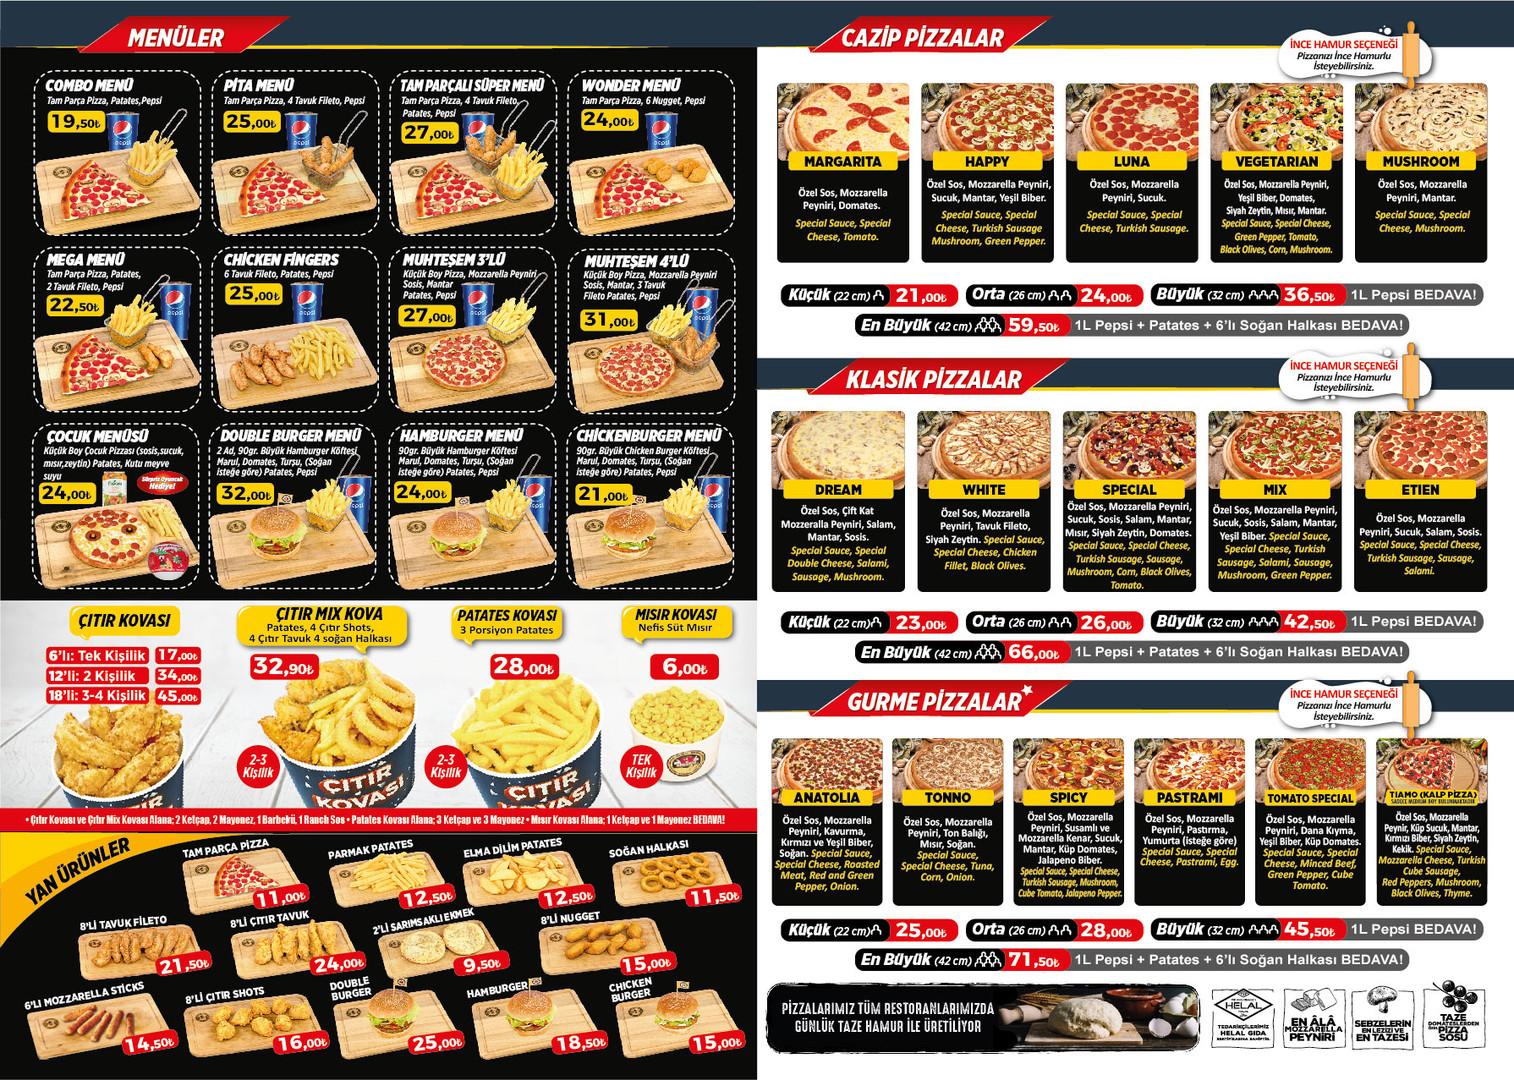 Pizza Tomato demirci menu arka sayfa.jpg